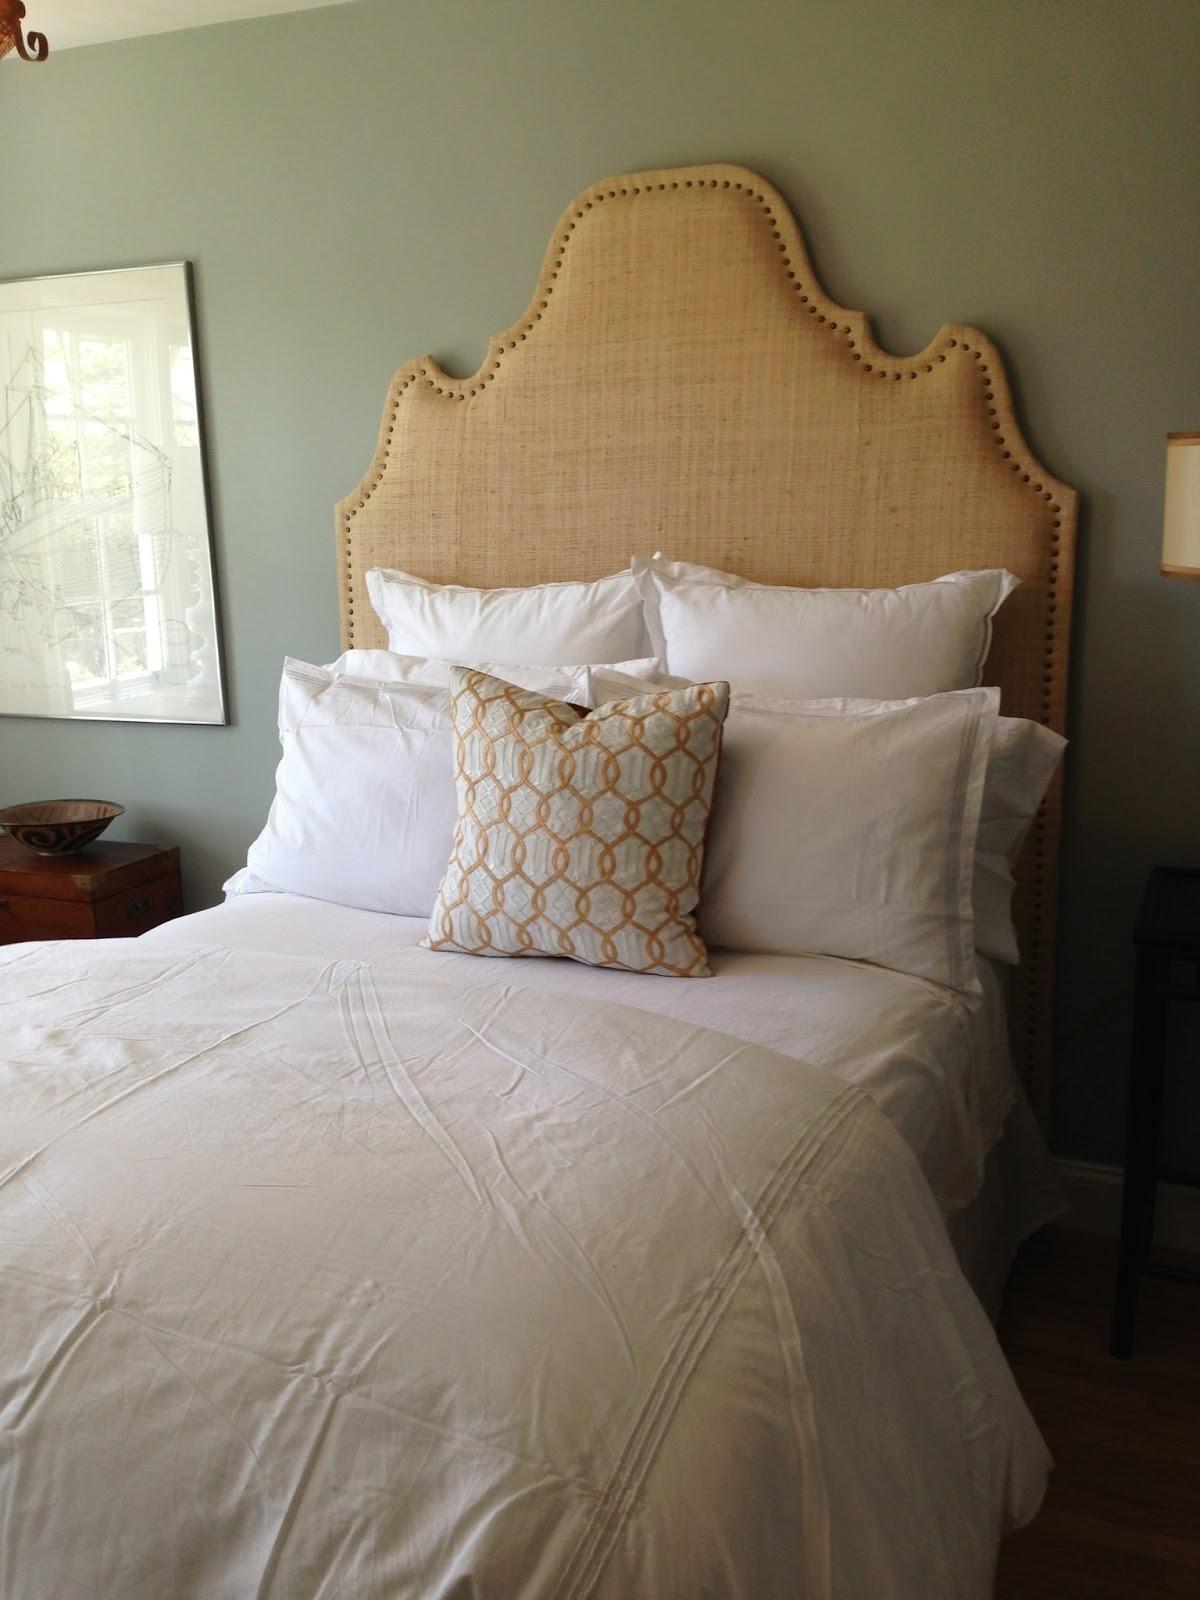 design ideas elegant wells photo on bedroom as interior size headboard burlap diy king